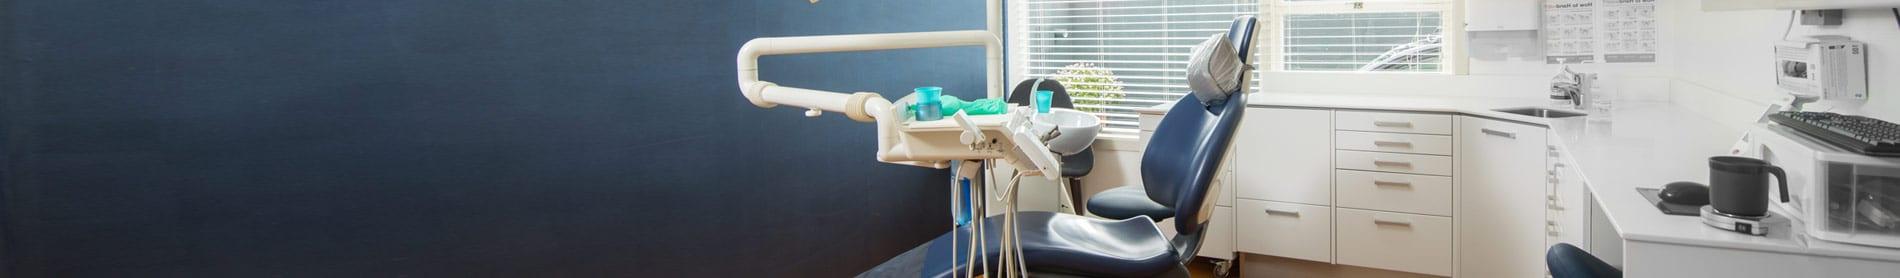 Manurewa Dentist Check Ups